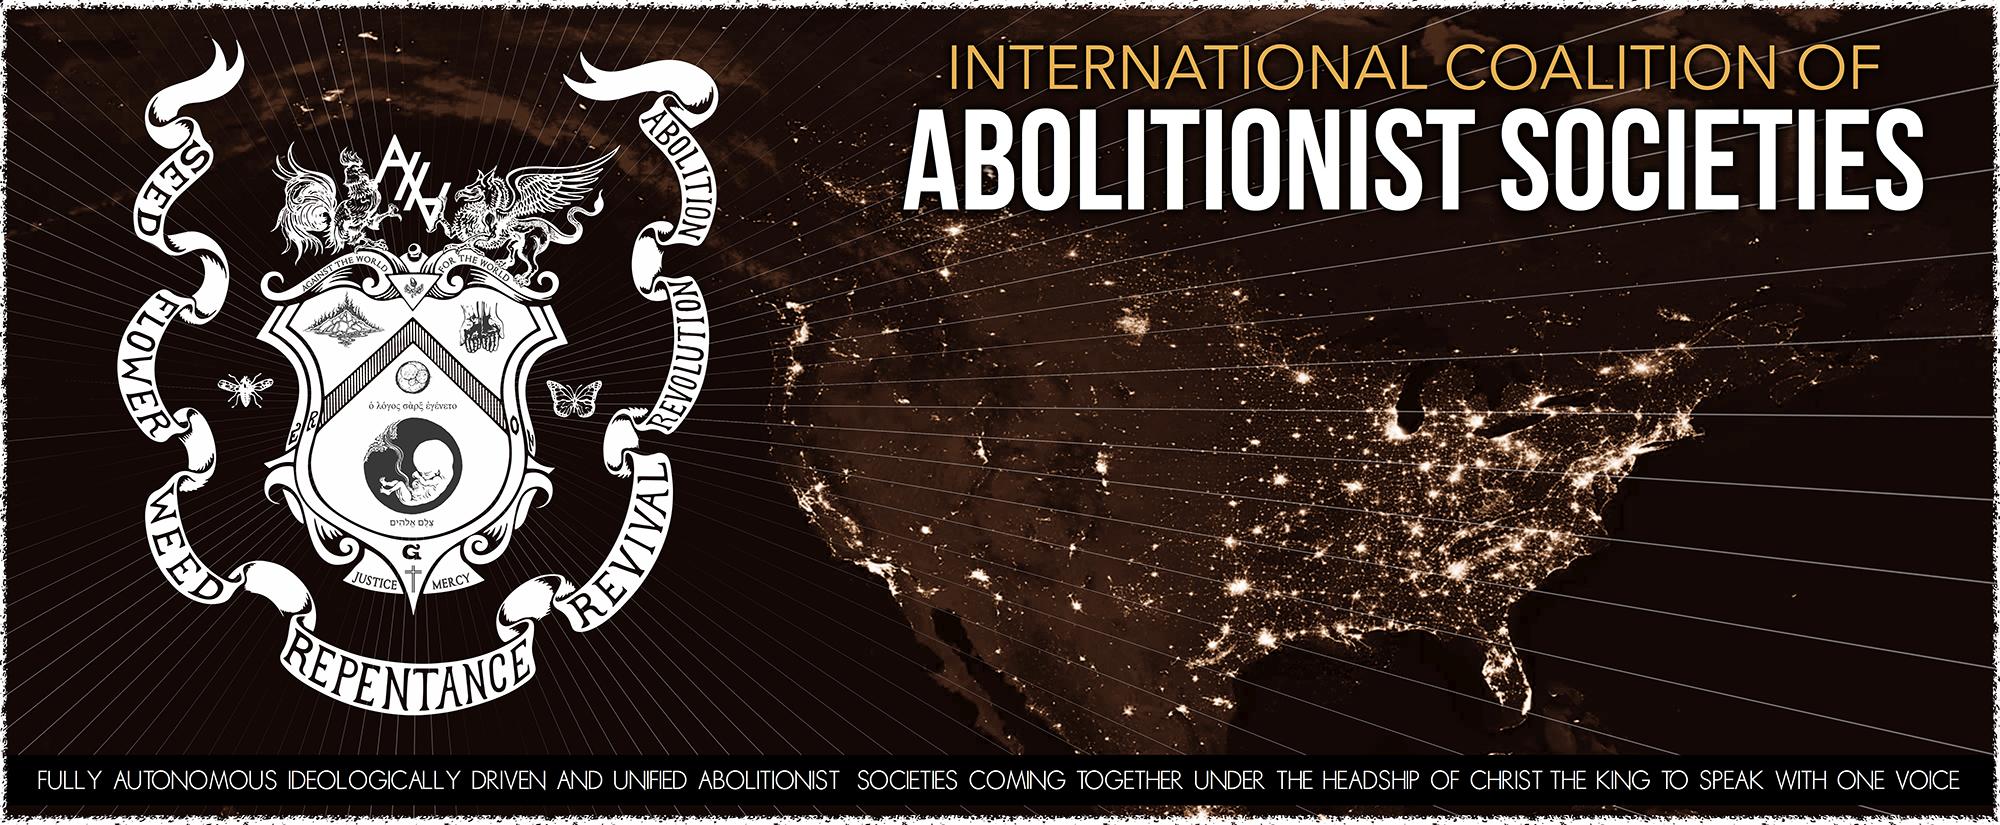 International Coalition of Abolitionist Societies